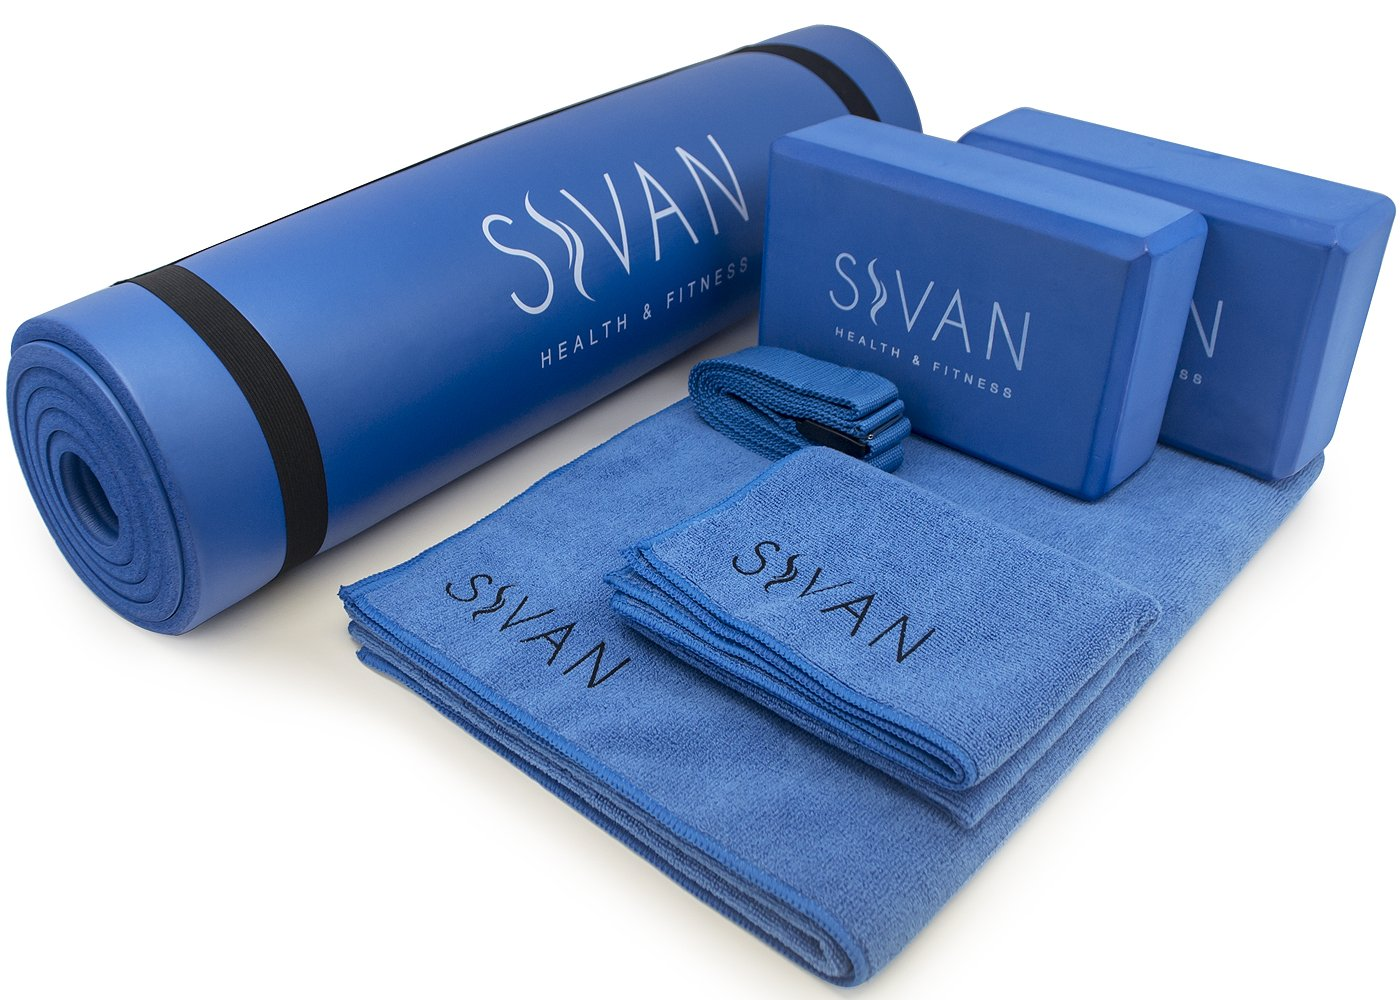 Sivan 6-Piece Yoga Set- Includes 1/2'' Ultra Thick NBR Exercise Mat, 2 Yoga Blocks, 1 Yoga Mat Towel, 1 Yoga Hand Towel and a Yoga Strap (Blue)